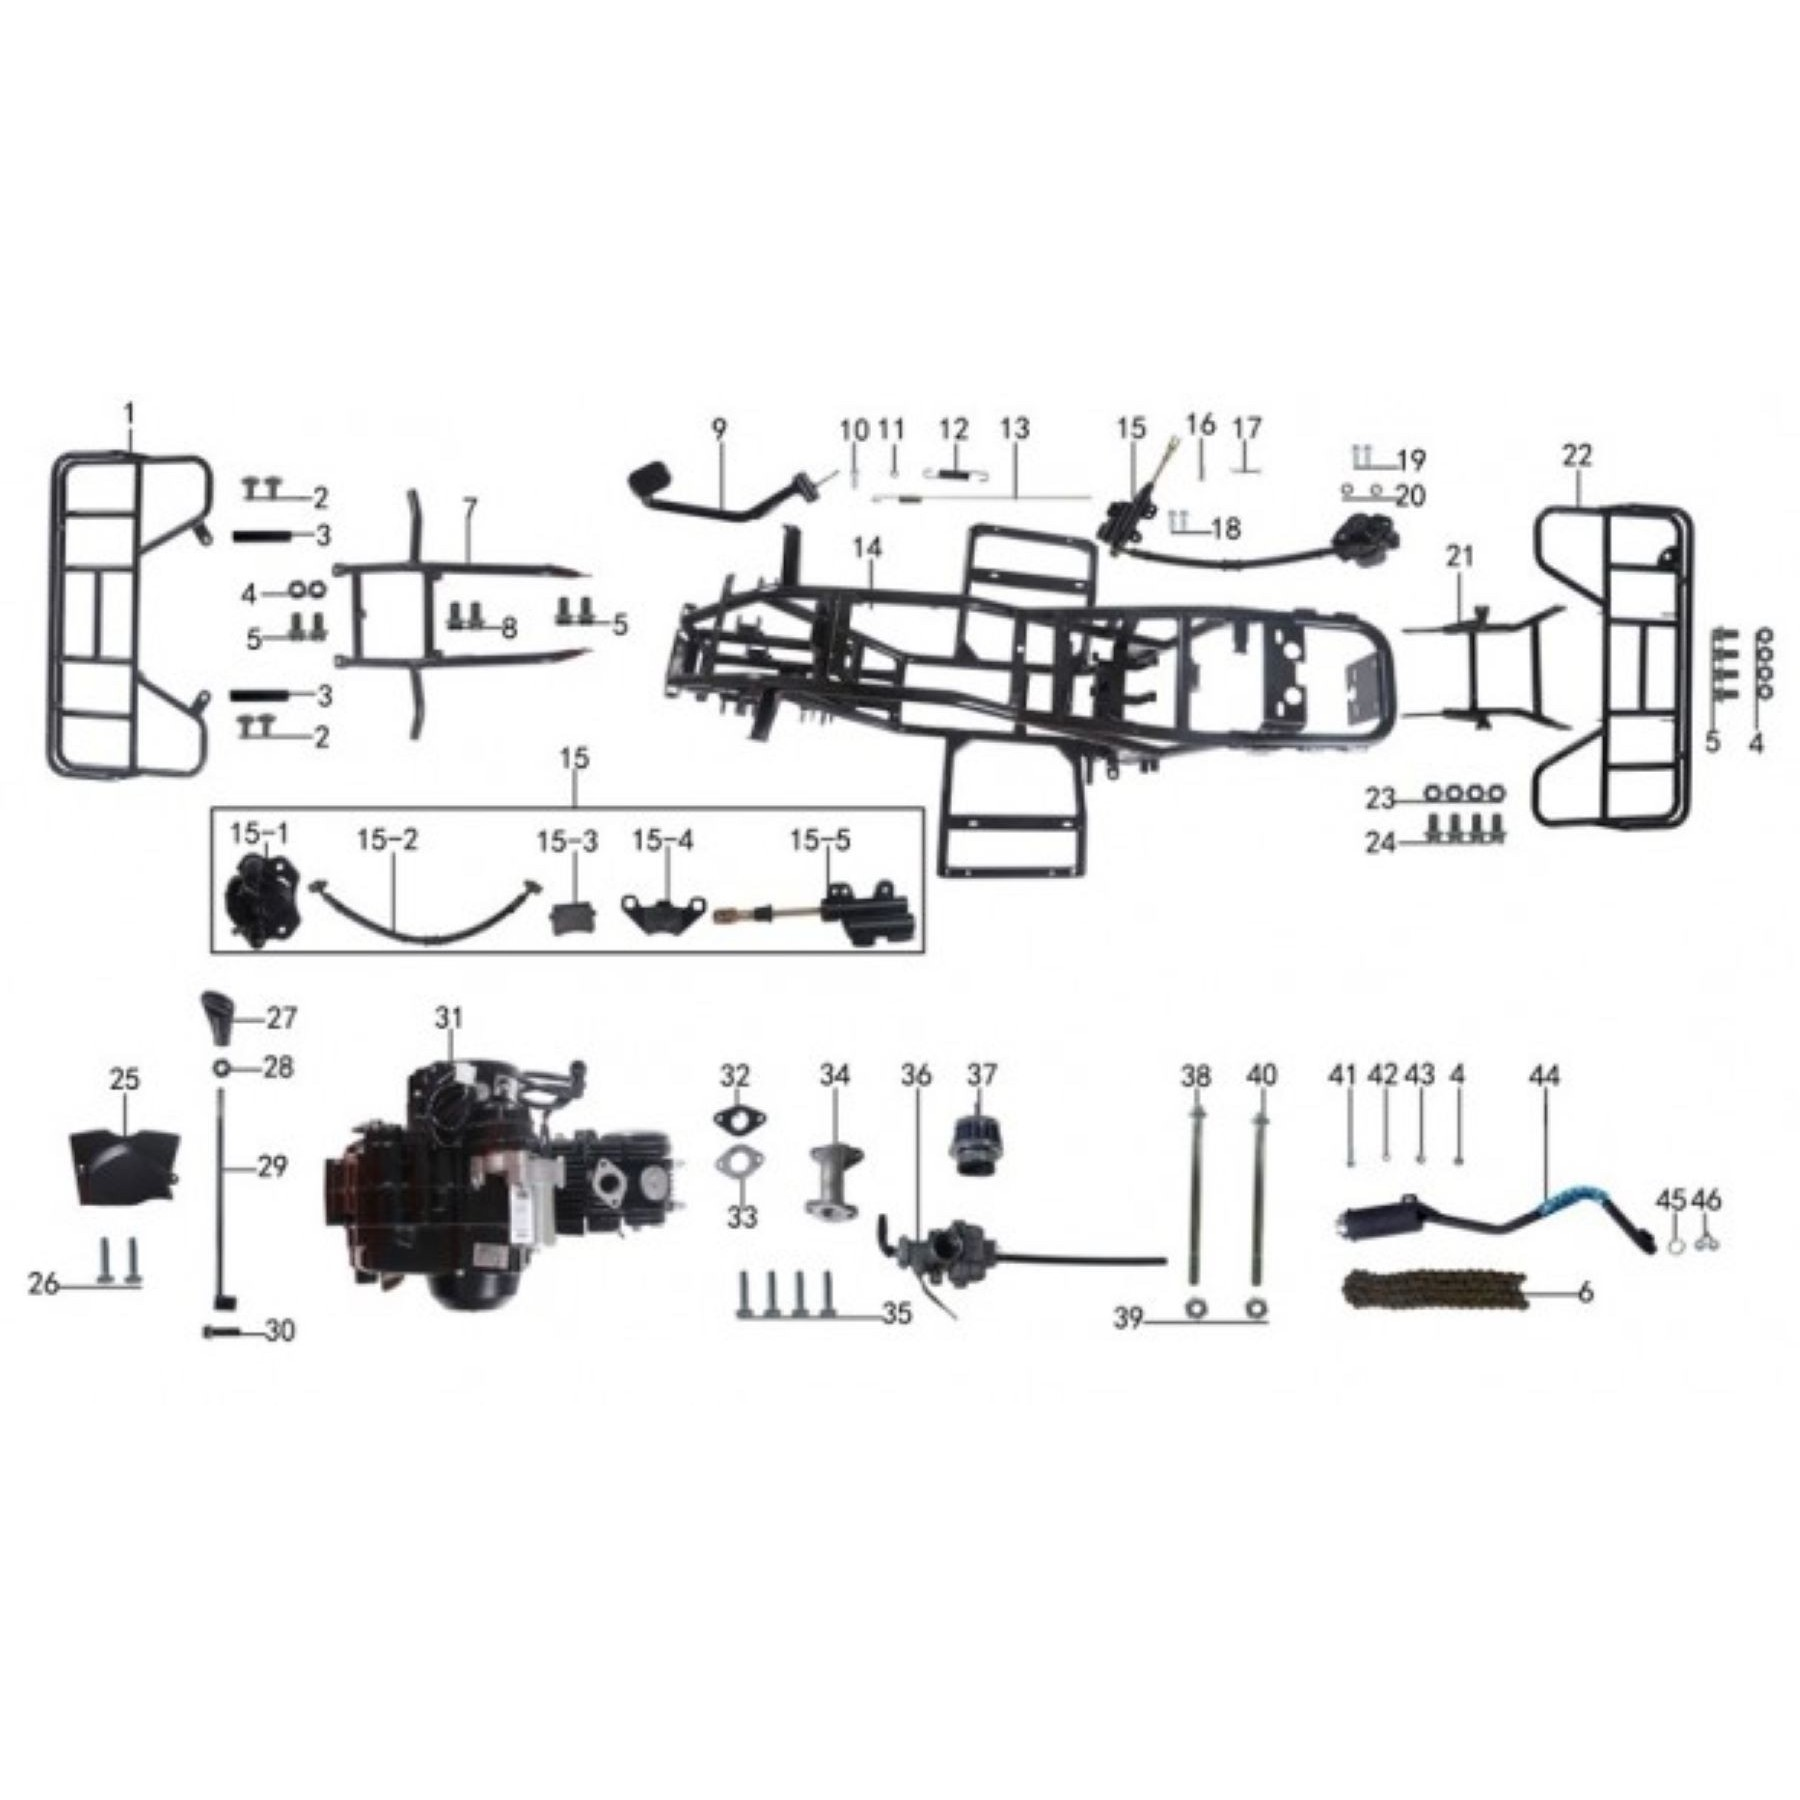 CD_8933] Taotao Atv 125 Parts Diagram Free DiagramDimet Akeb Rect Mohammedshrine Librar Wiring 101